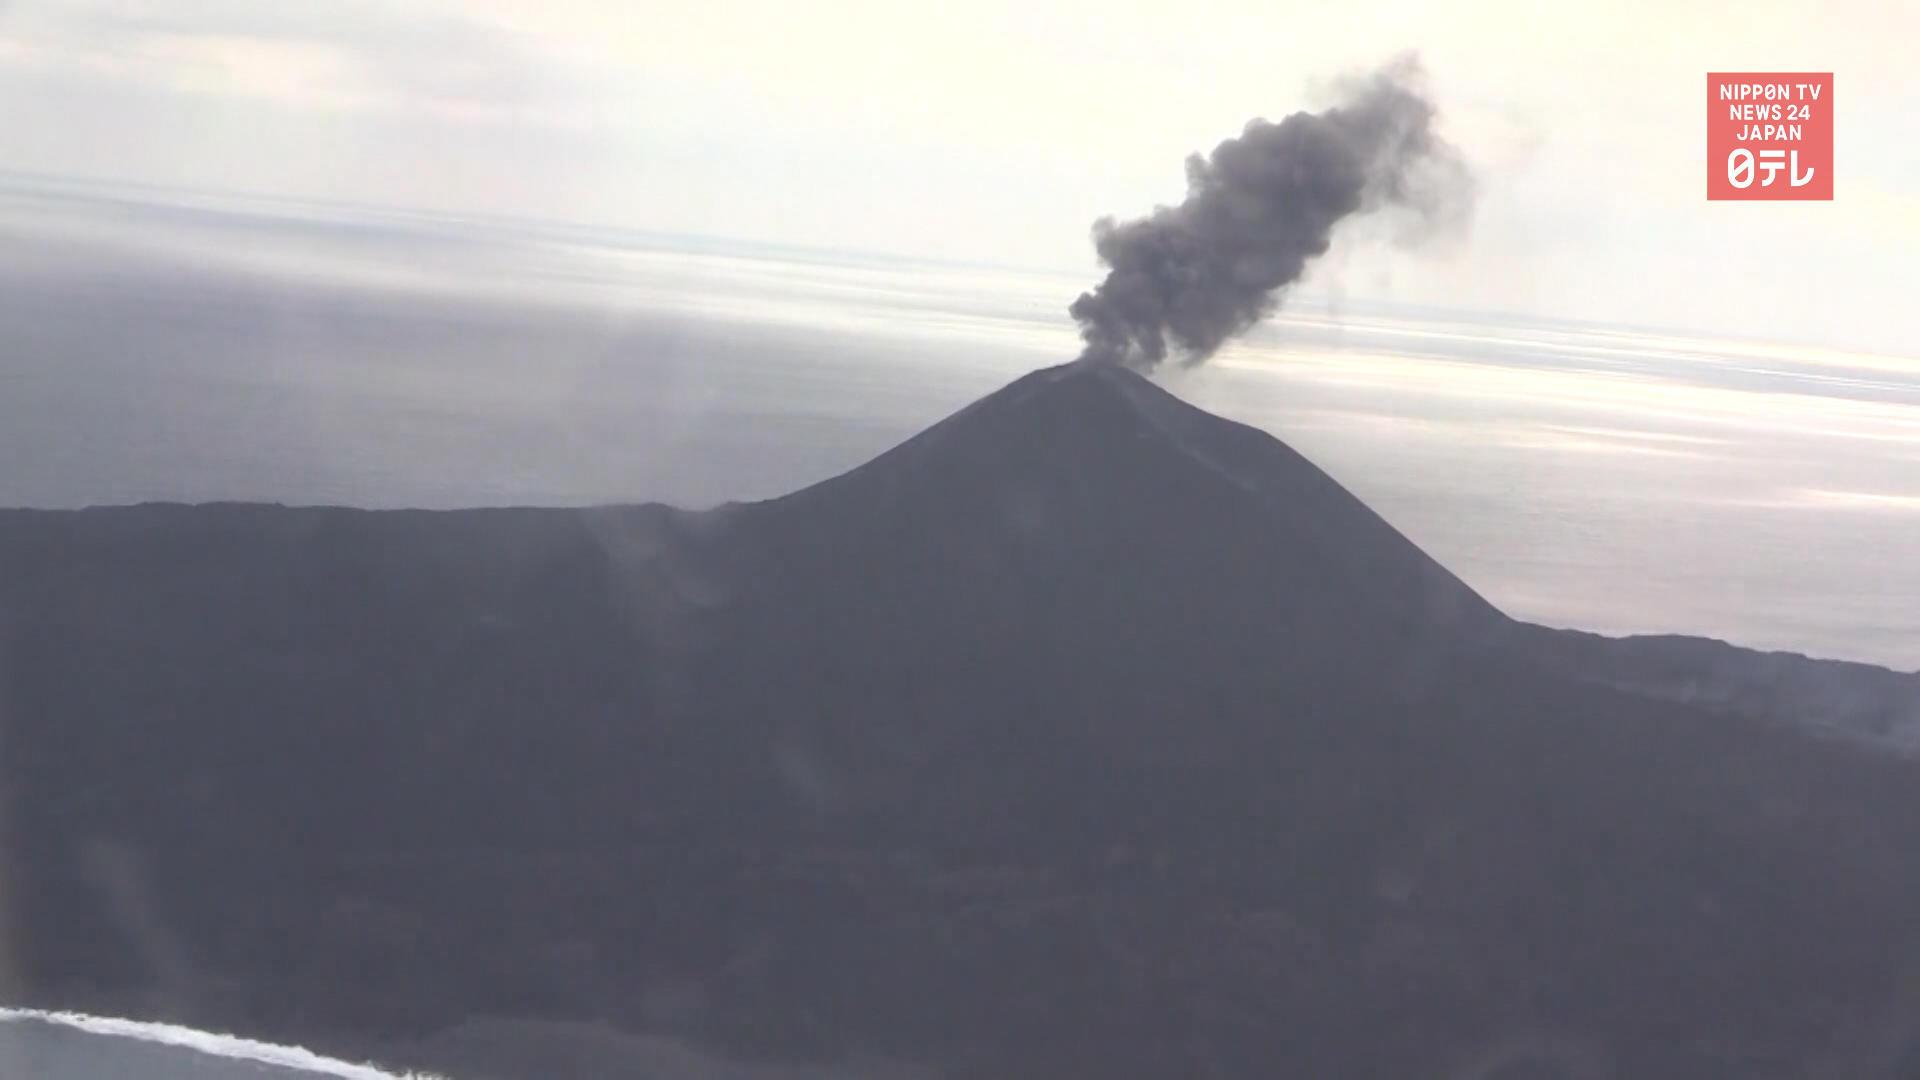 Volcanic island erupting and growing